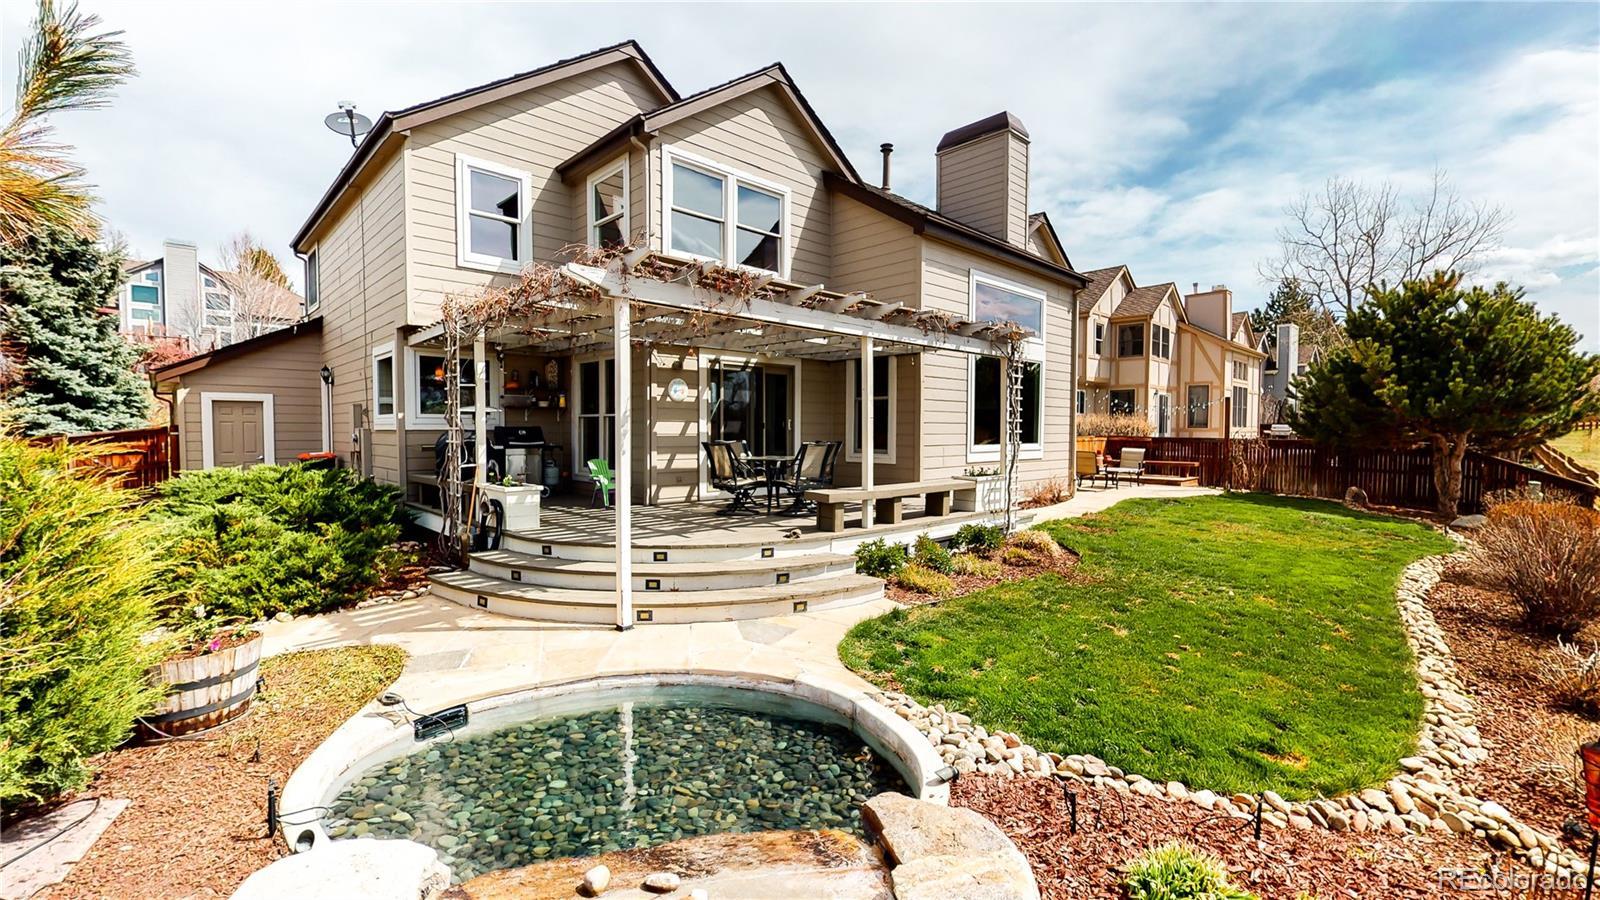 MLS# 9424893 - 3 - 2174 Terrace Drive, Highlands Ranch, CO 80126